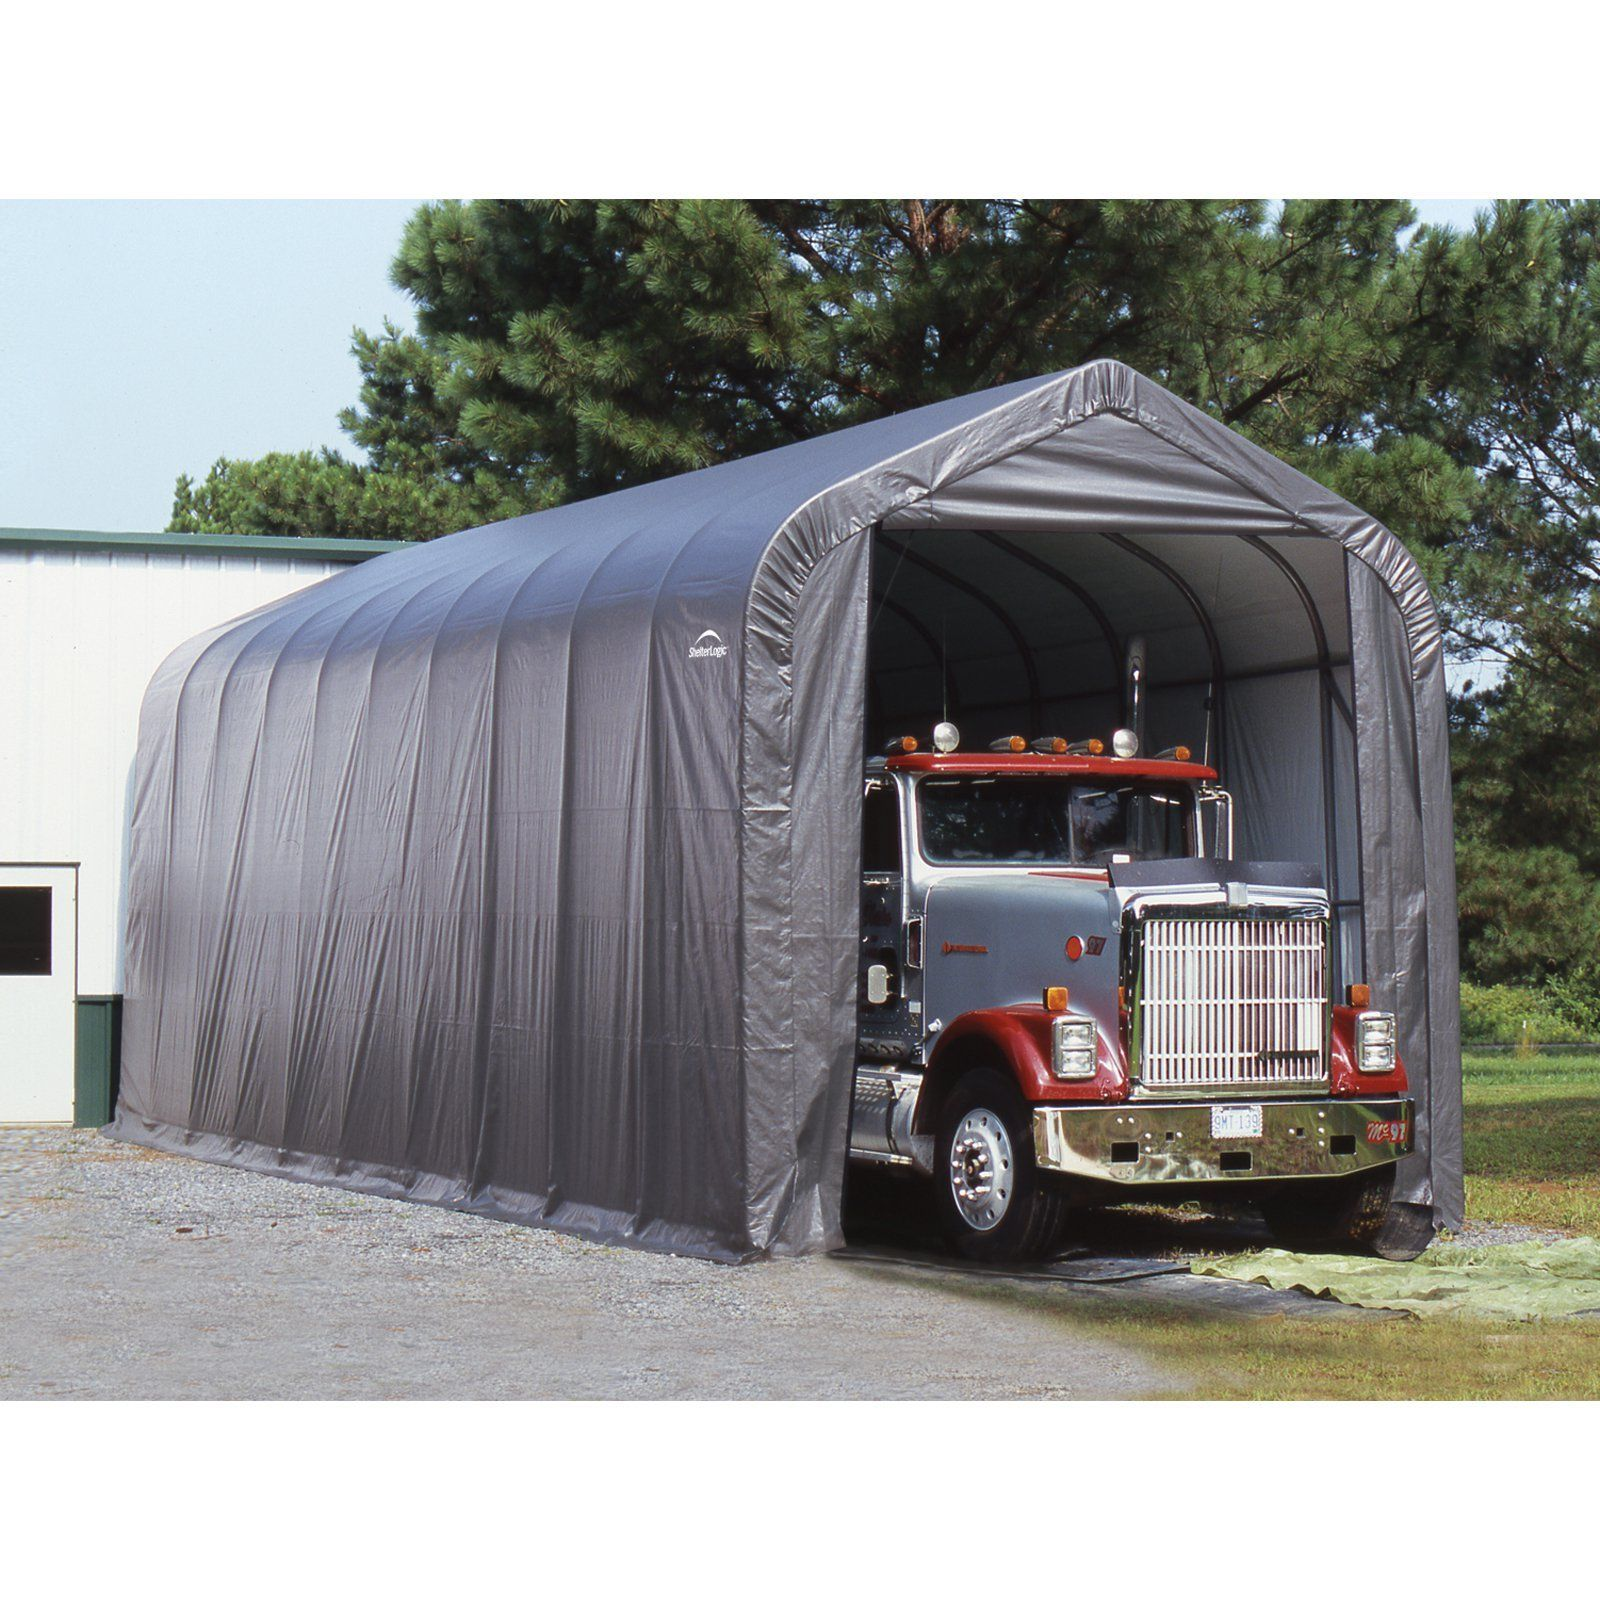 ShelterLogic 15 x 20 x 12 ft. Peak Frame Garage Shelter